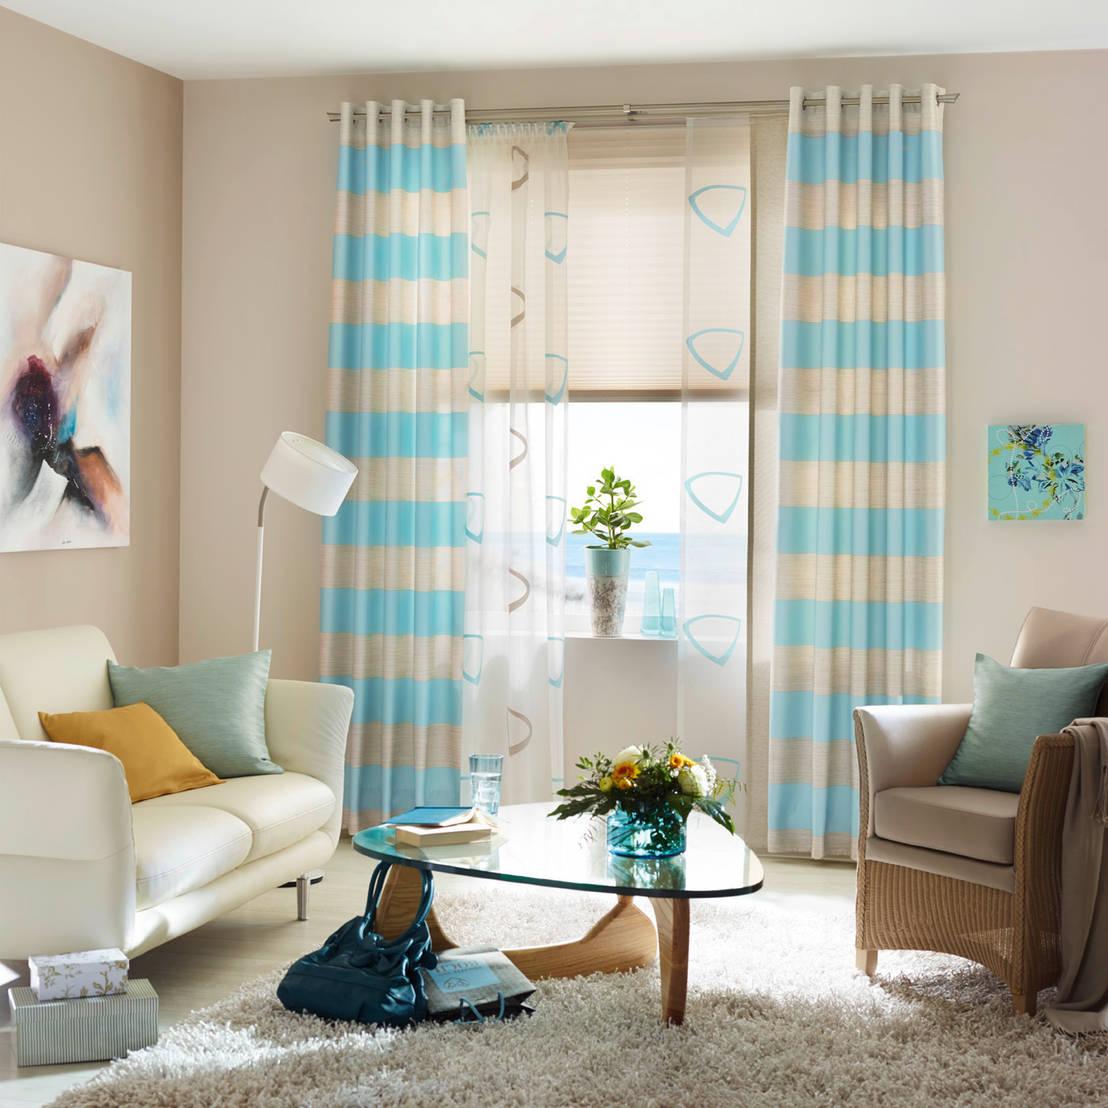 Salones peque os 5 trucos de decoraci n for Cortinas para salones pequenos